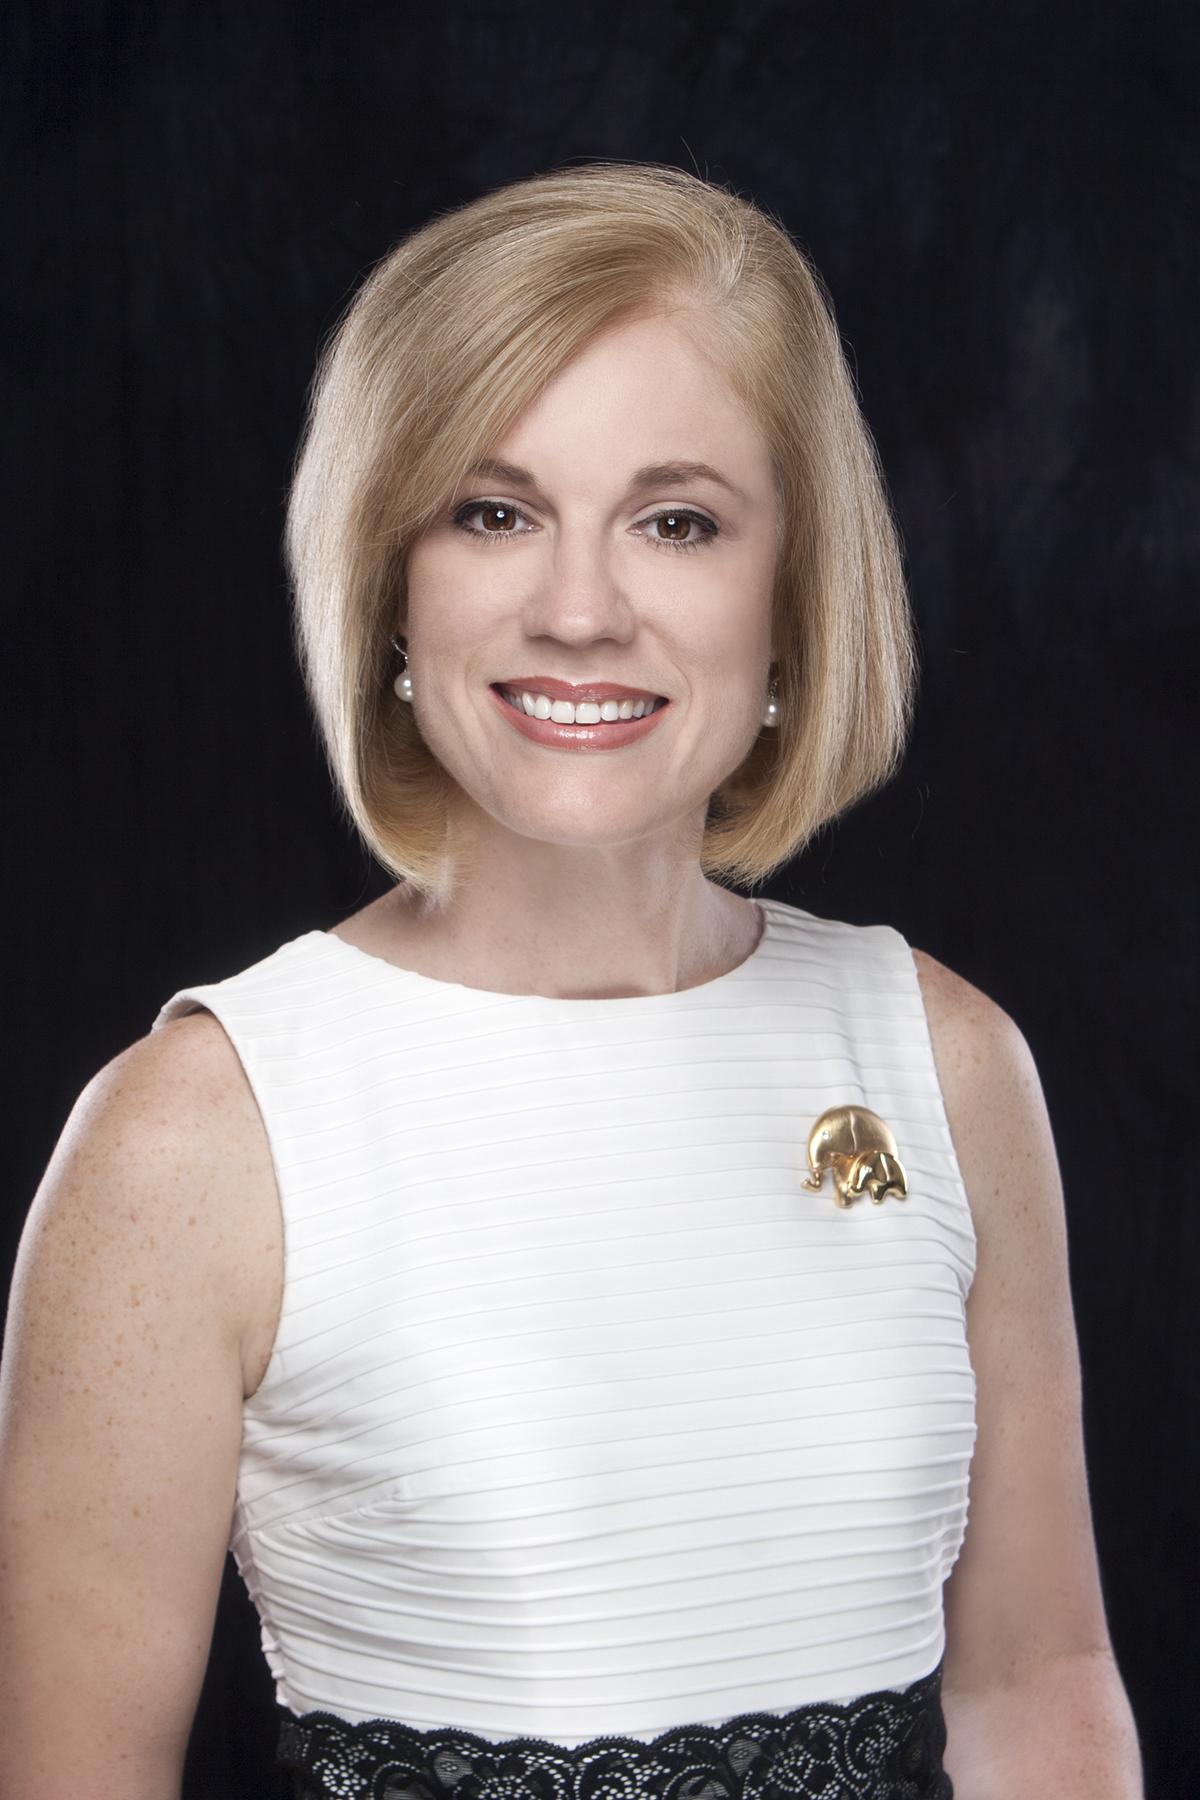 Danica Joan